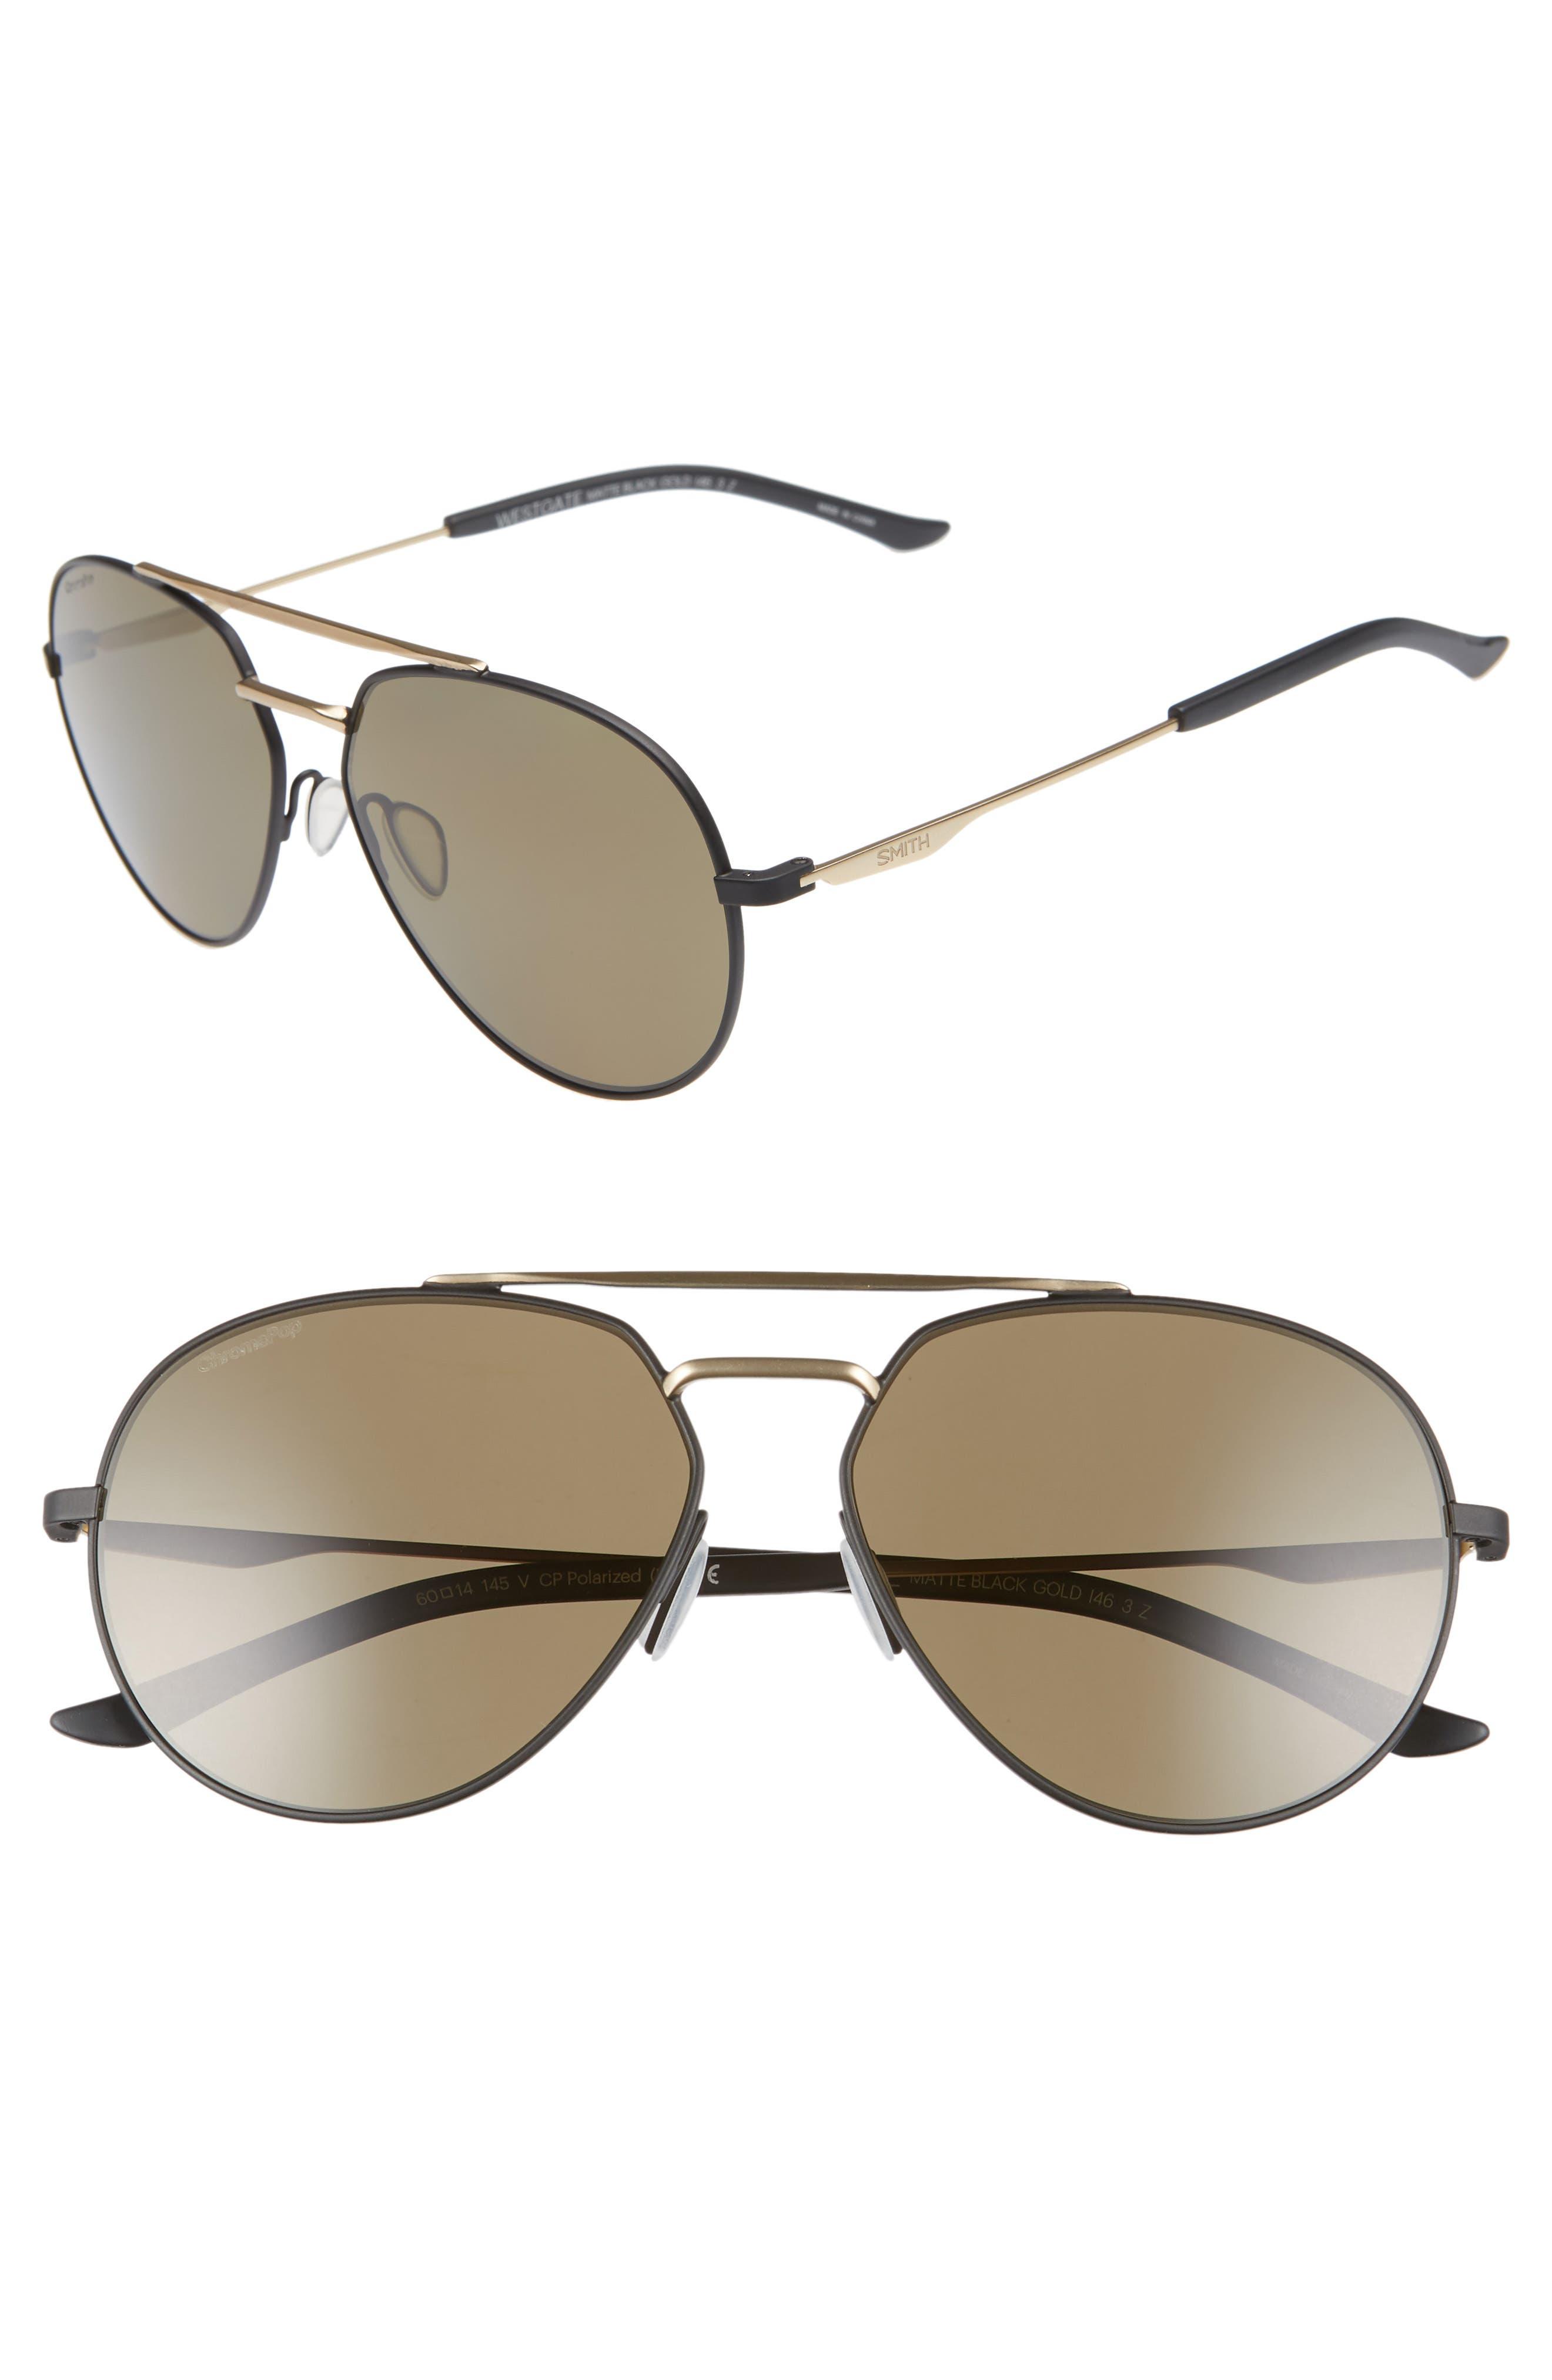 SMITH Westgate 60mm ChromaPop<sup>™</sup> Polarized Aviator Sunglasses, Main, color, MATTE BLACK/ GOLD